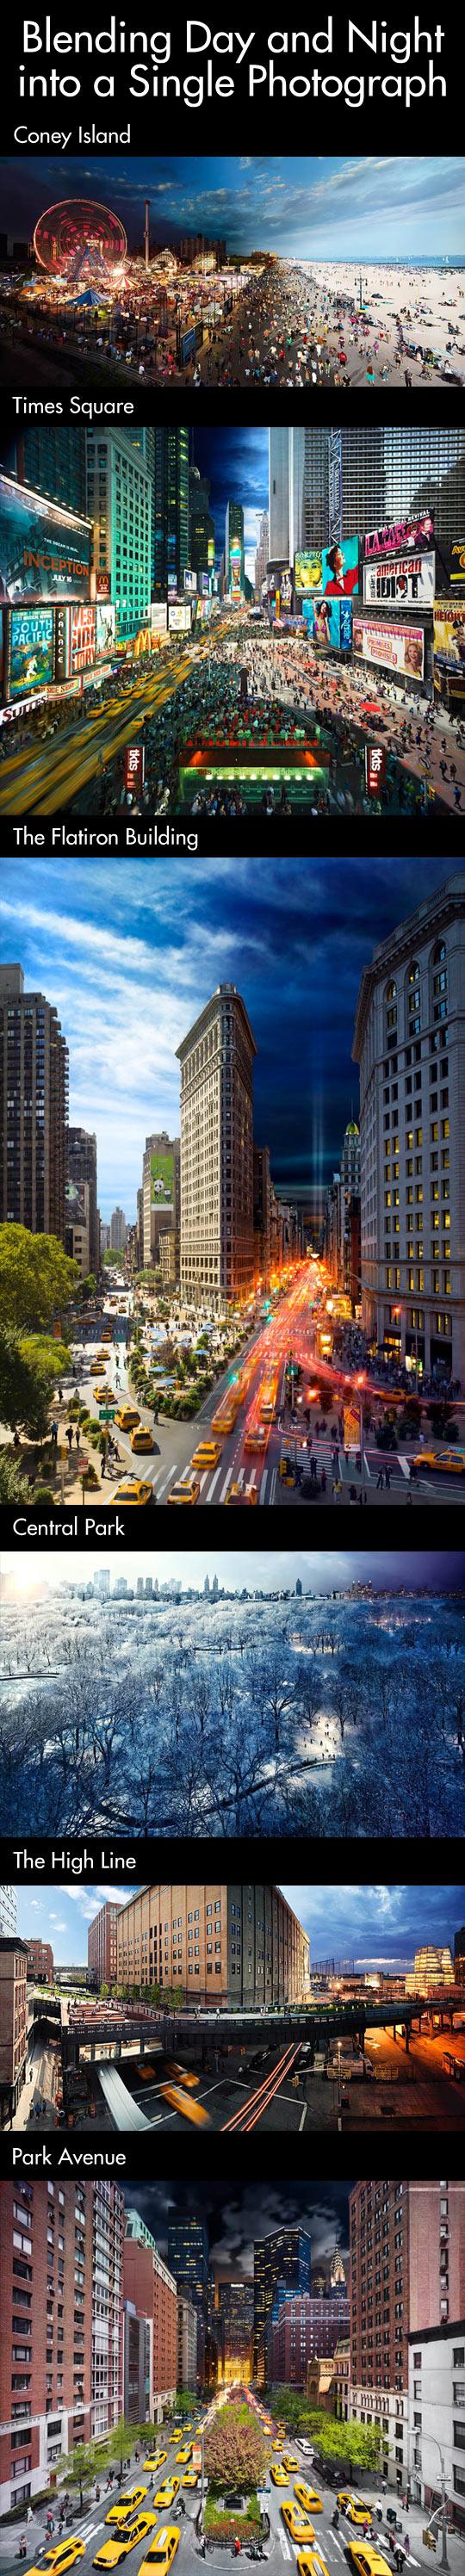 funny-blending-city-lights-day-night